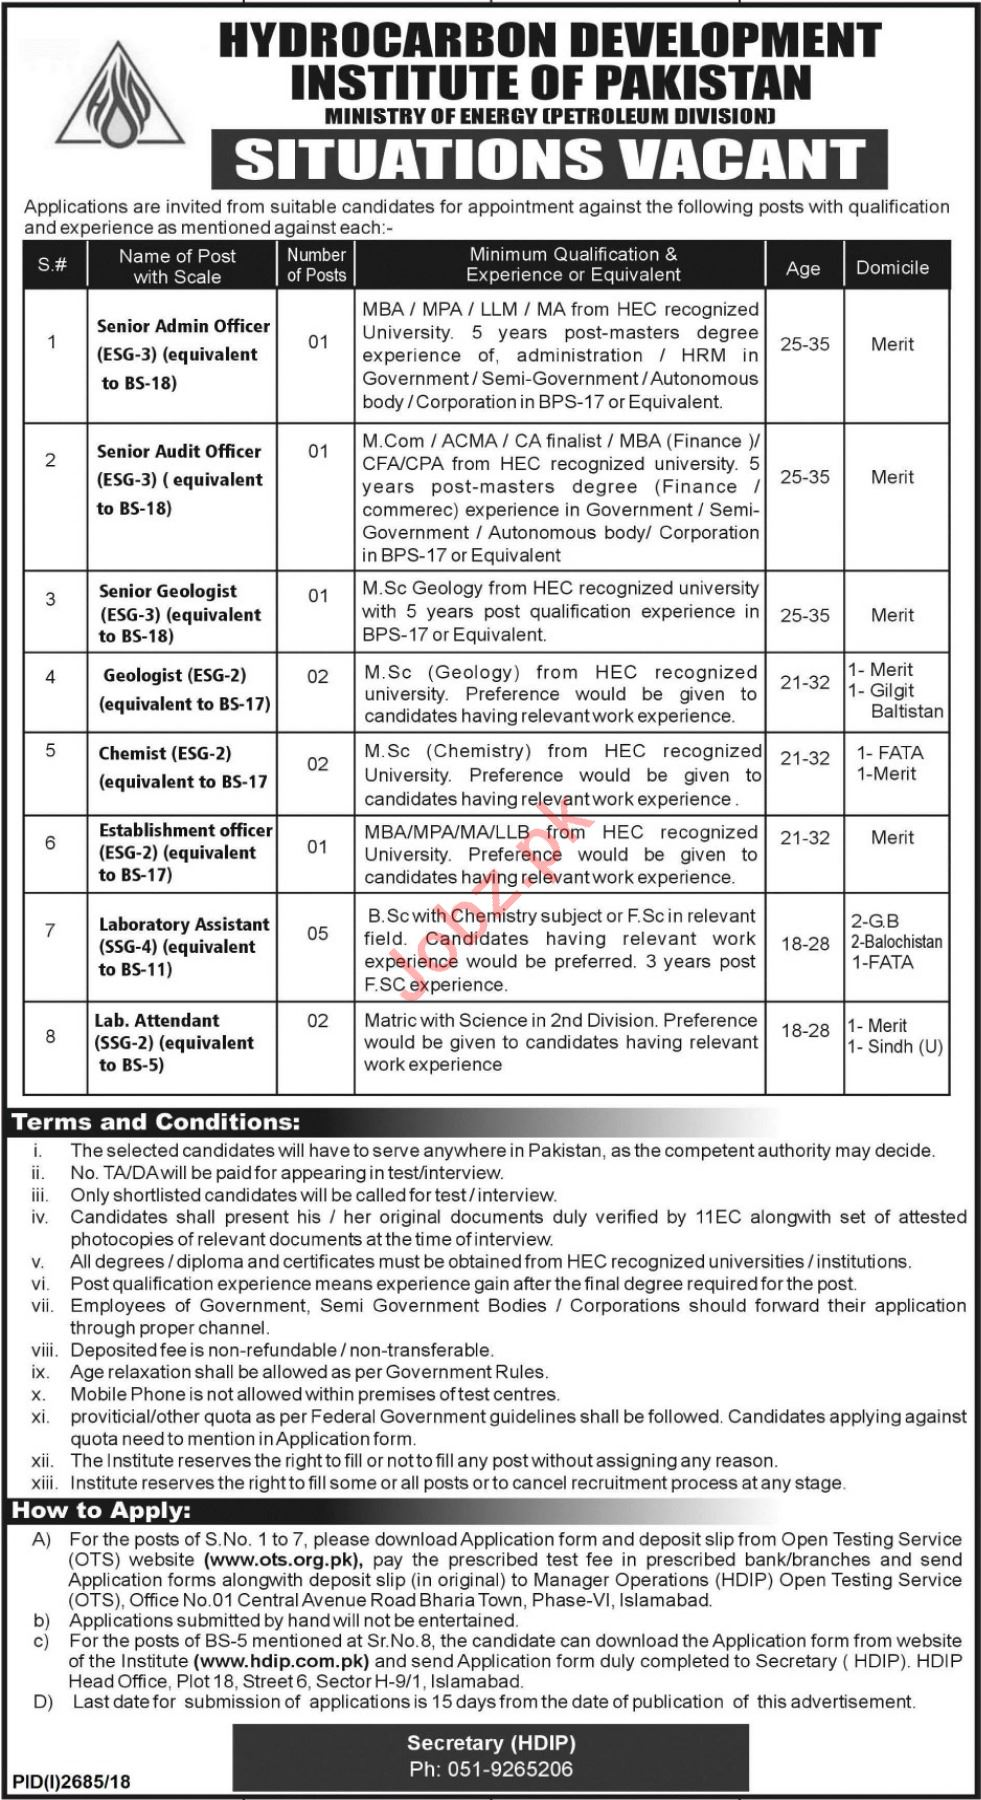 Hydrocarbon Development Institute of Pakistan Jobs via OTS